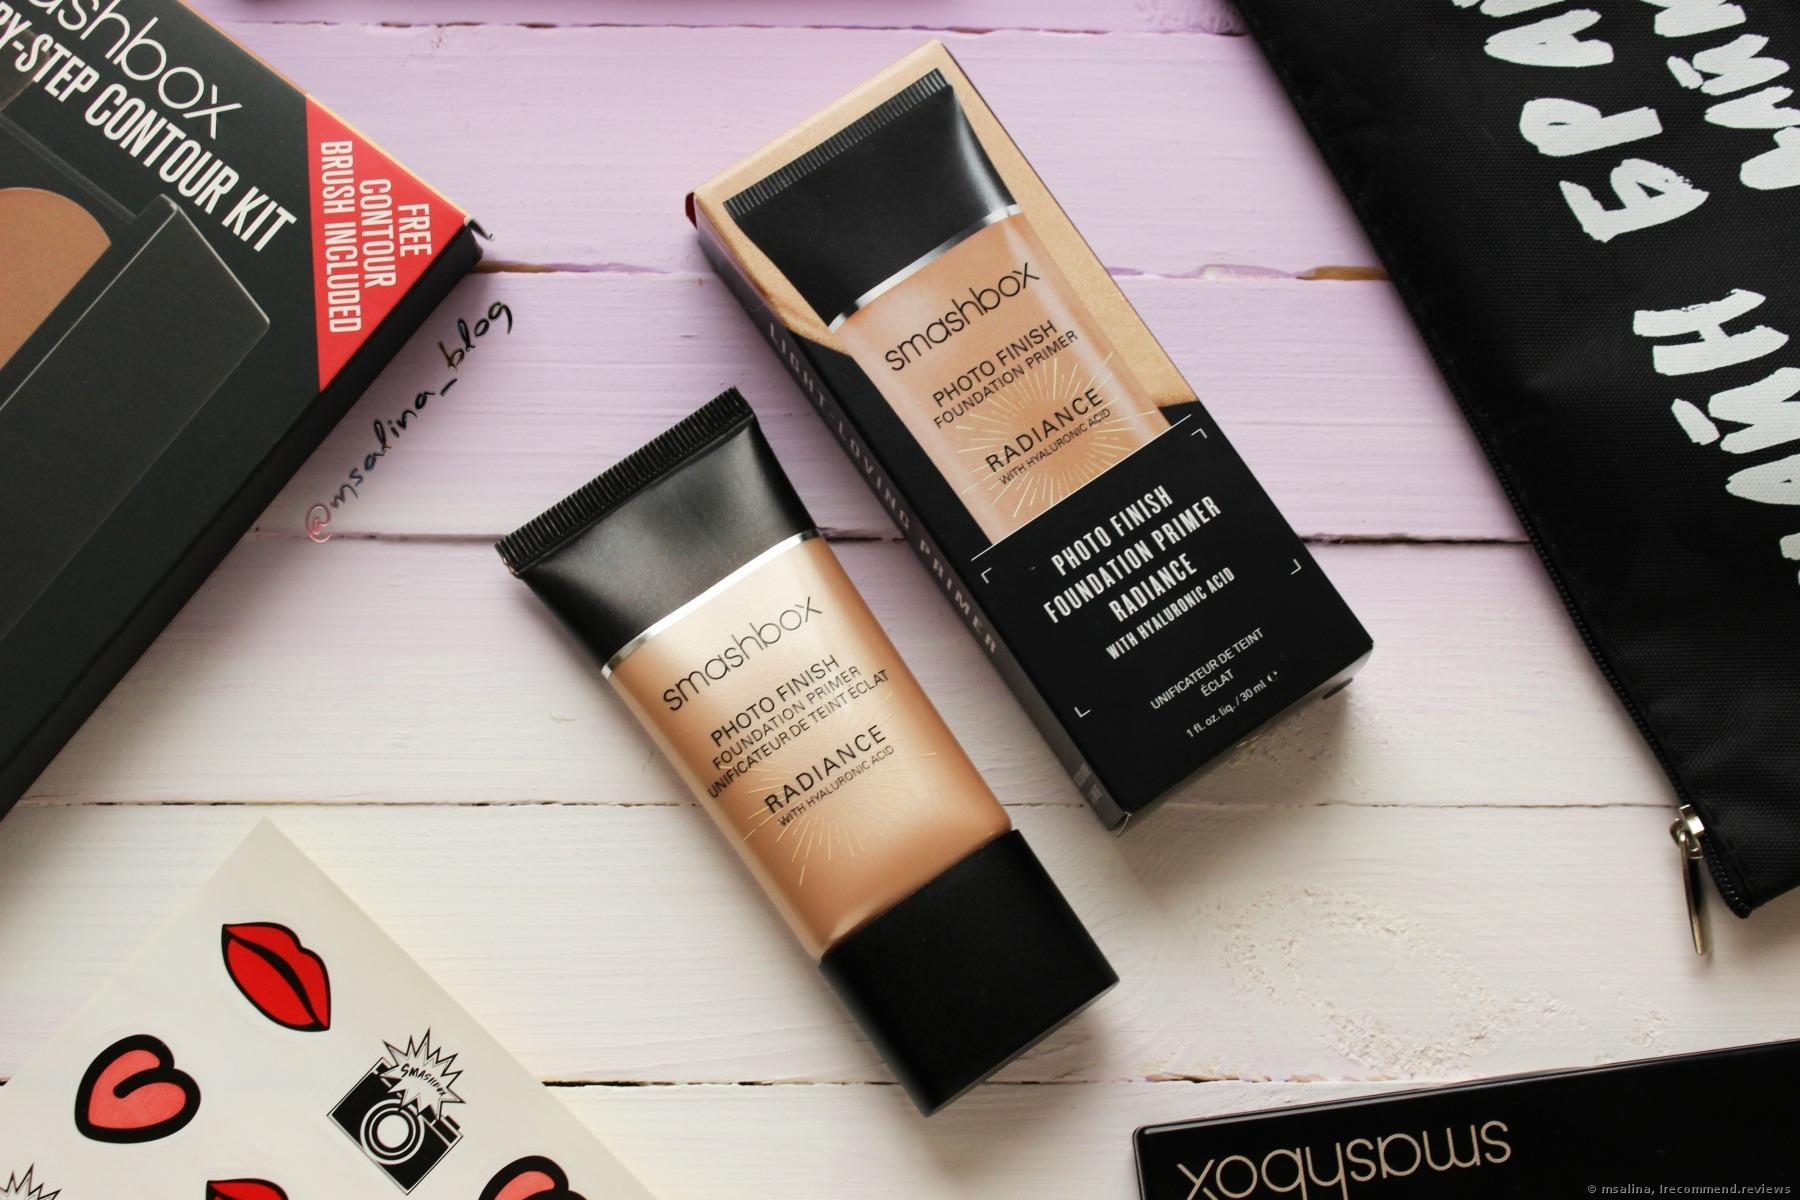 Cosmetics Smashbox (Smashbox): manufacturer, reviews